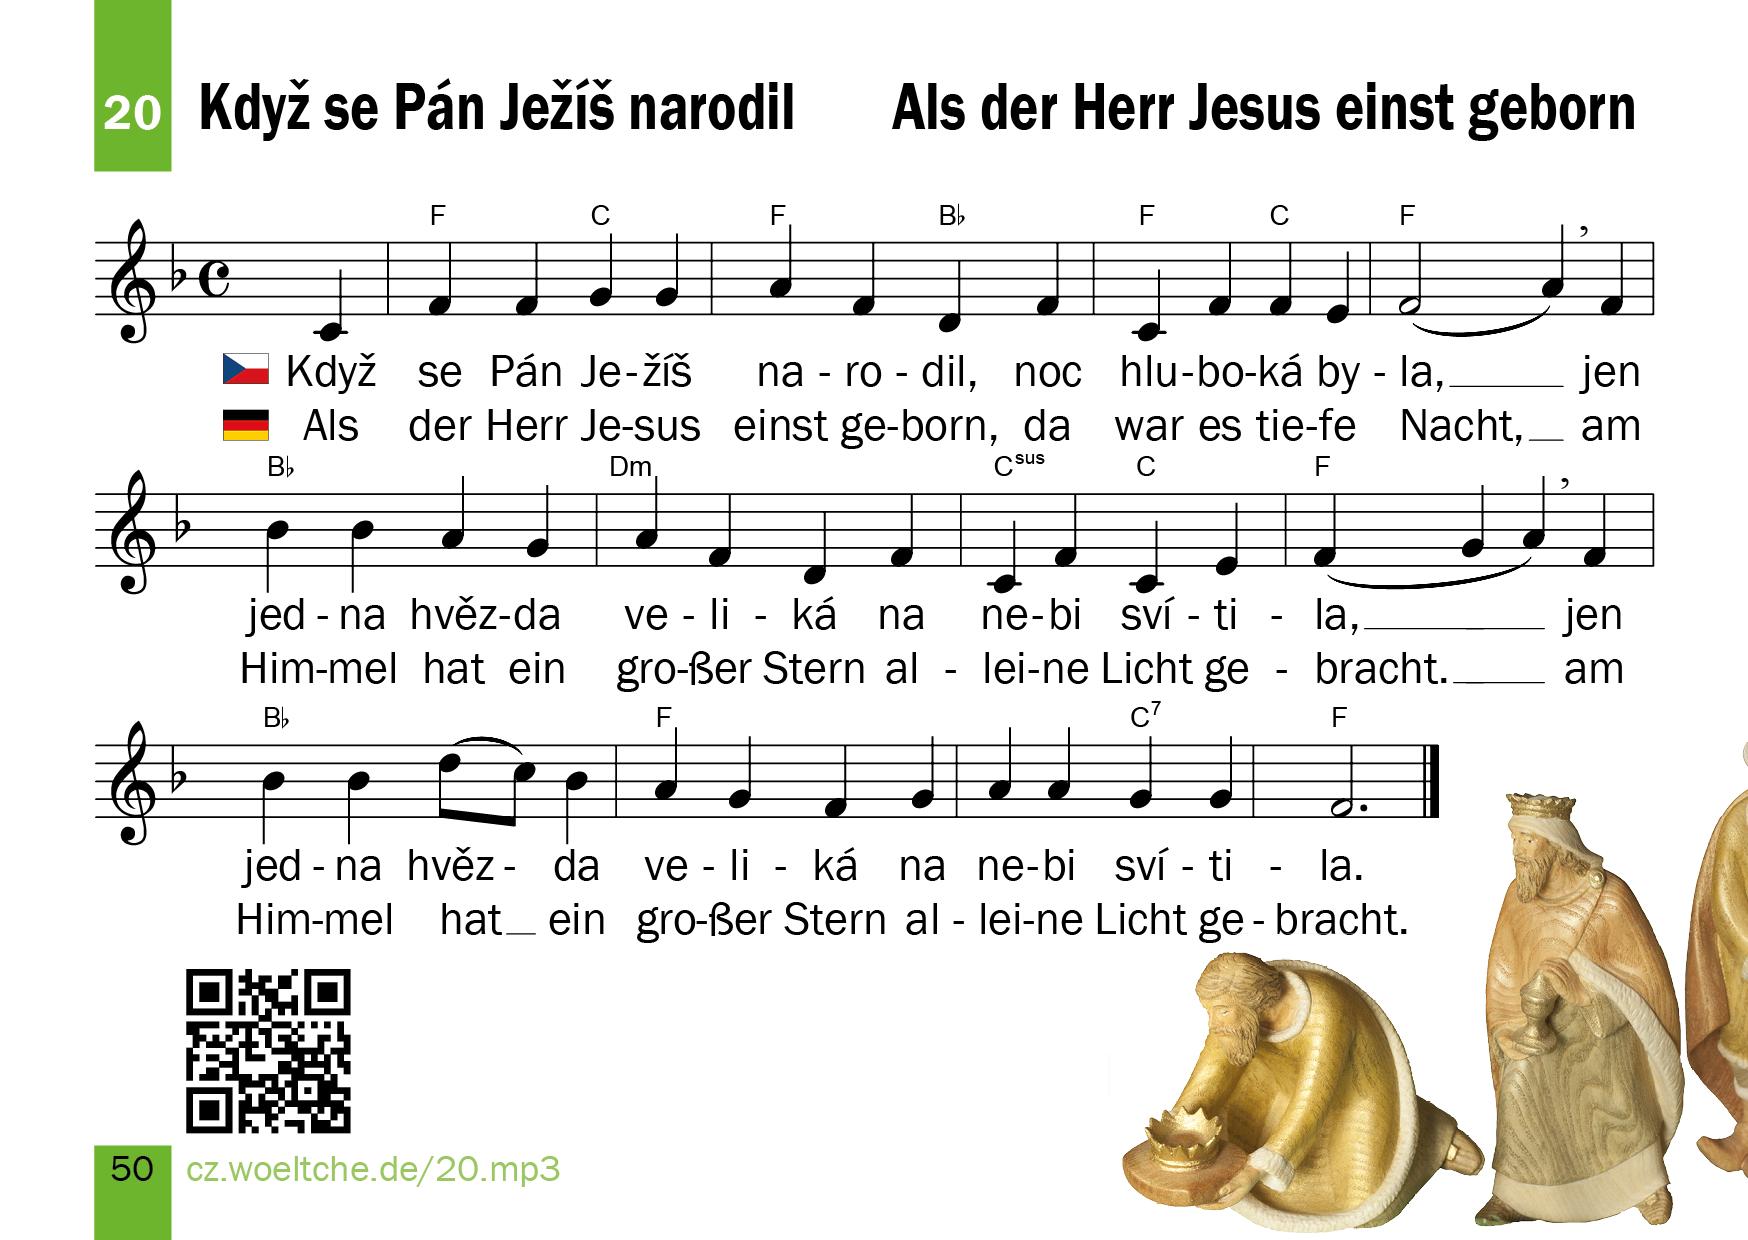 Tschechische Weihnachtslieder.Download Weihnachtslieder Vánoční Písně A Koledy